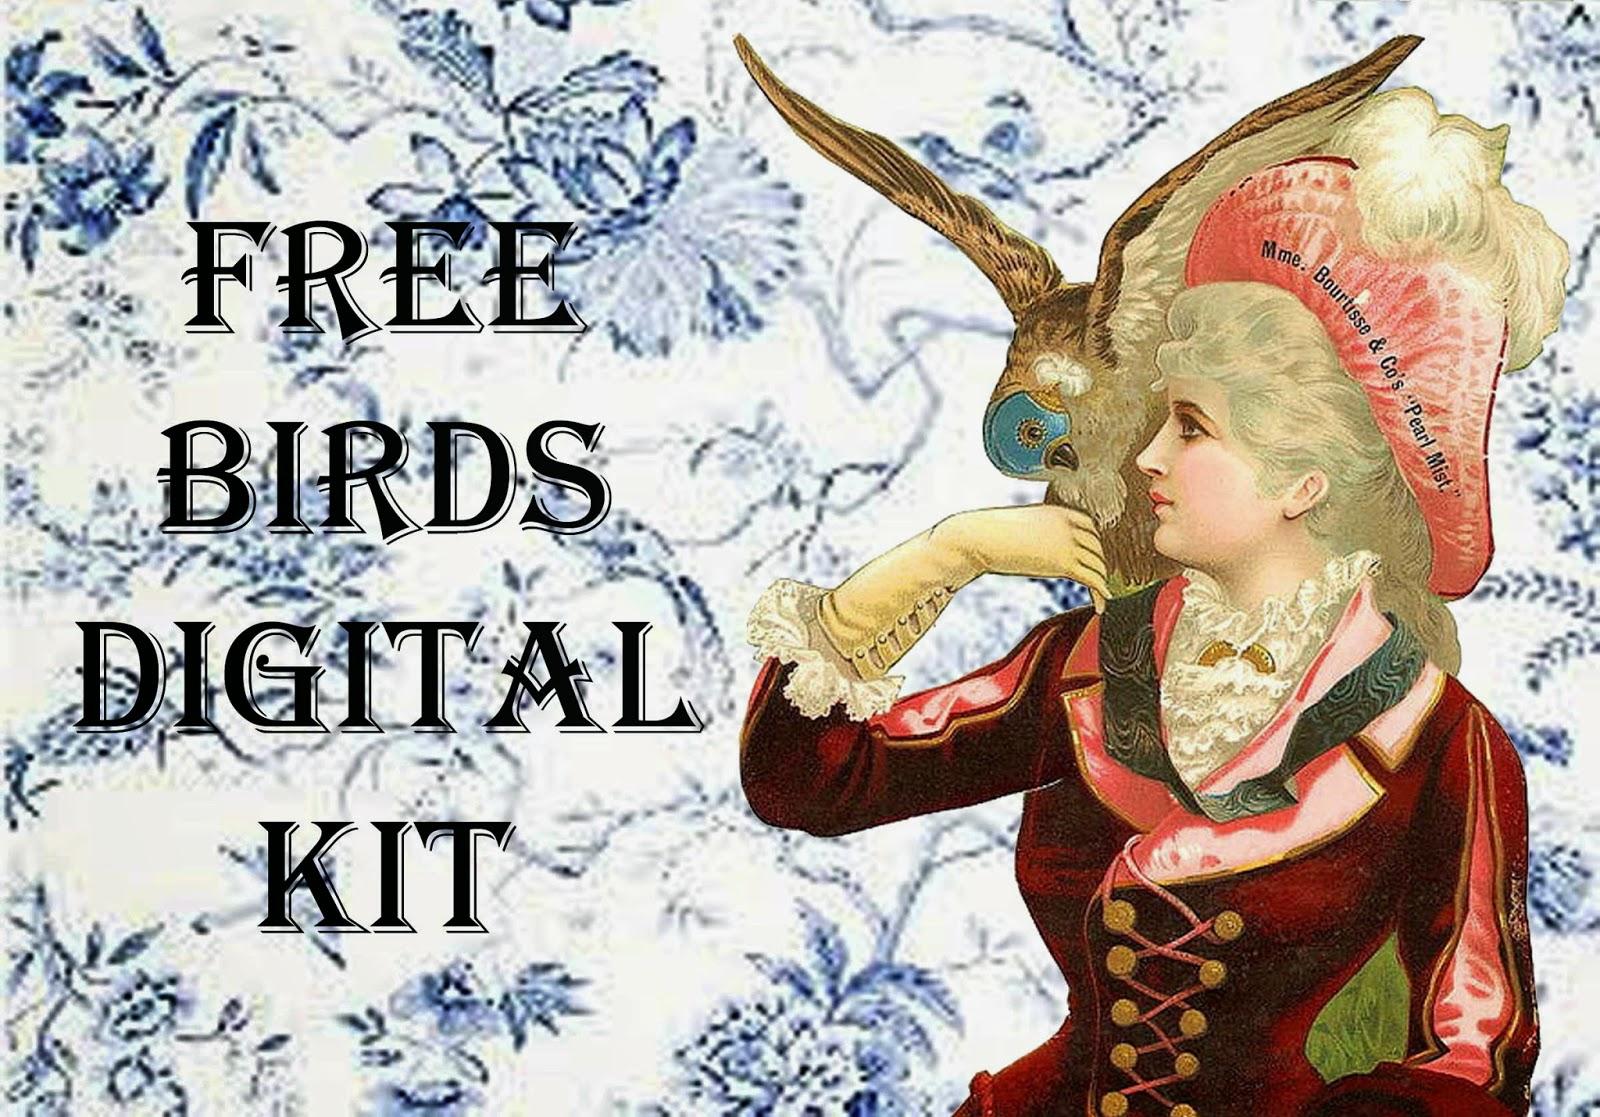 http://4.bp.blogspot.com/-fV47H1aRZdc/VJ7mRawykwI/AAAAAAAAFV4/aXeL8_OUpgU/s1600/free+birds+cvr.jpg